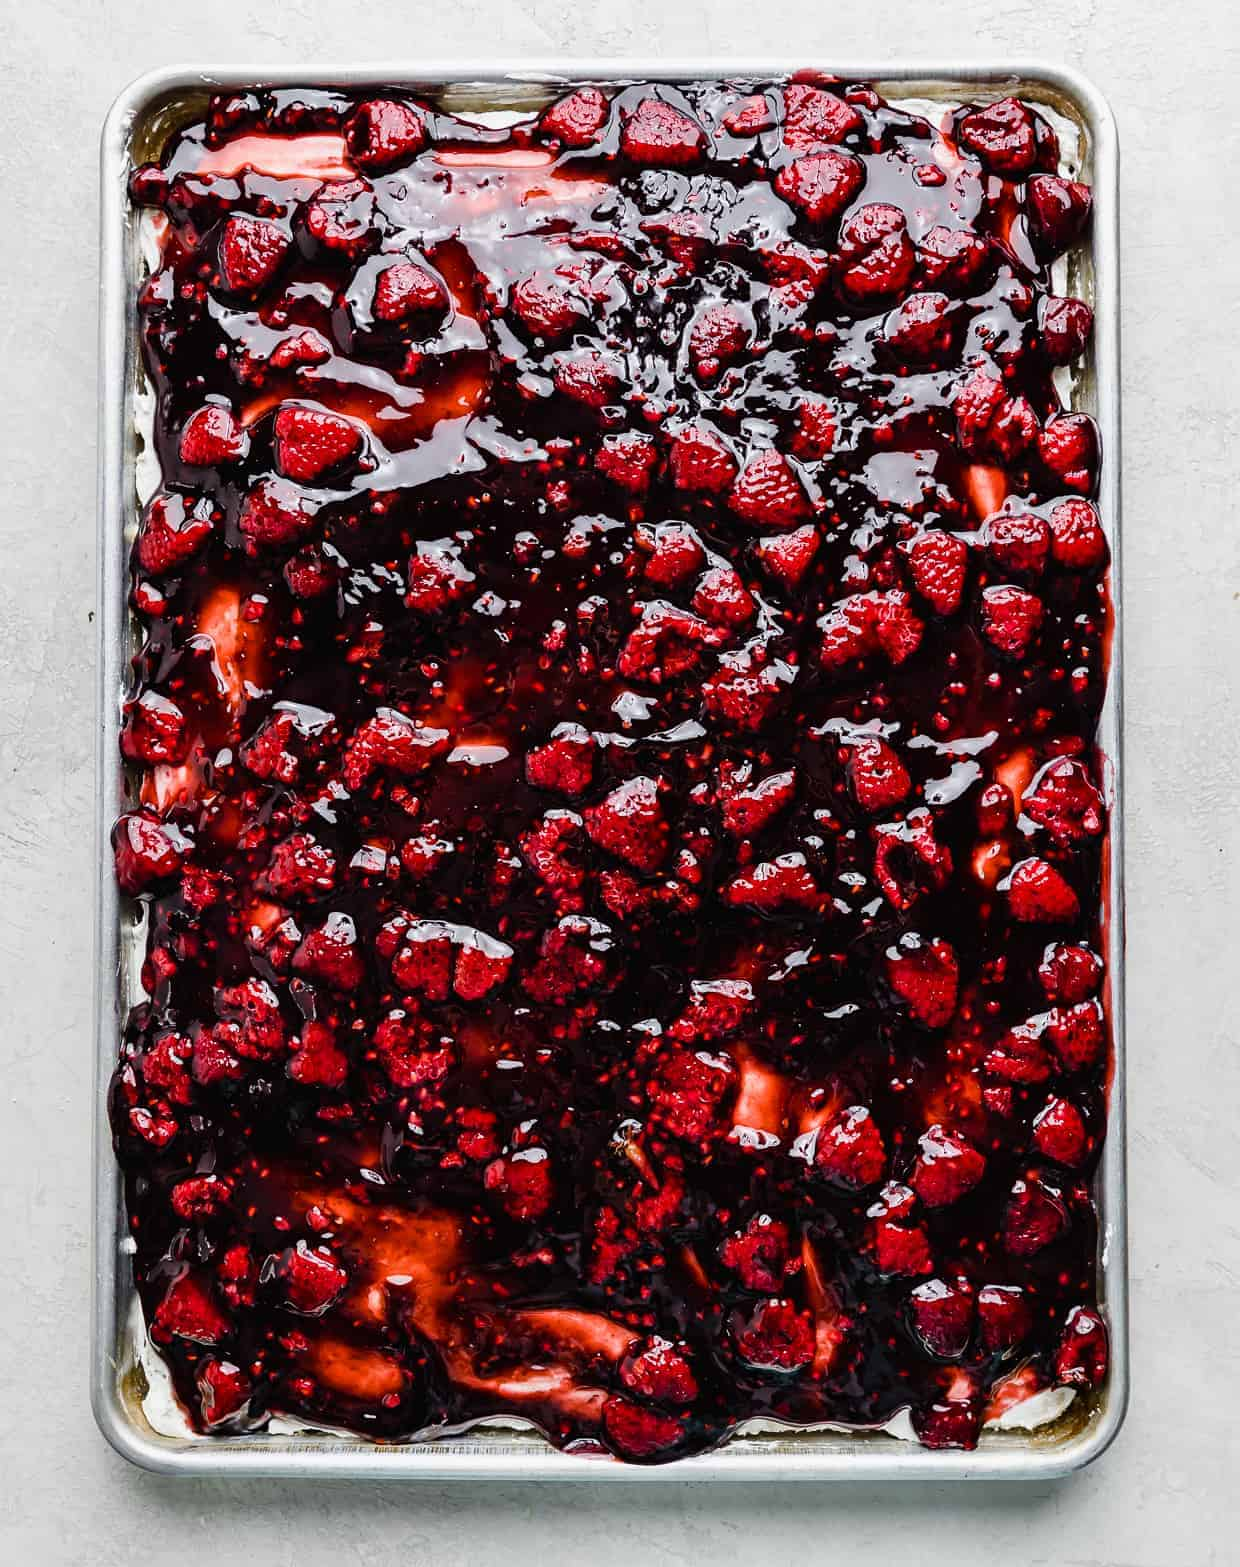 A deep red colored gelatin raspberry sauce spread overtop a baking sheet.